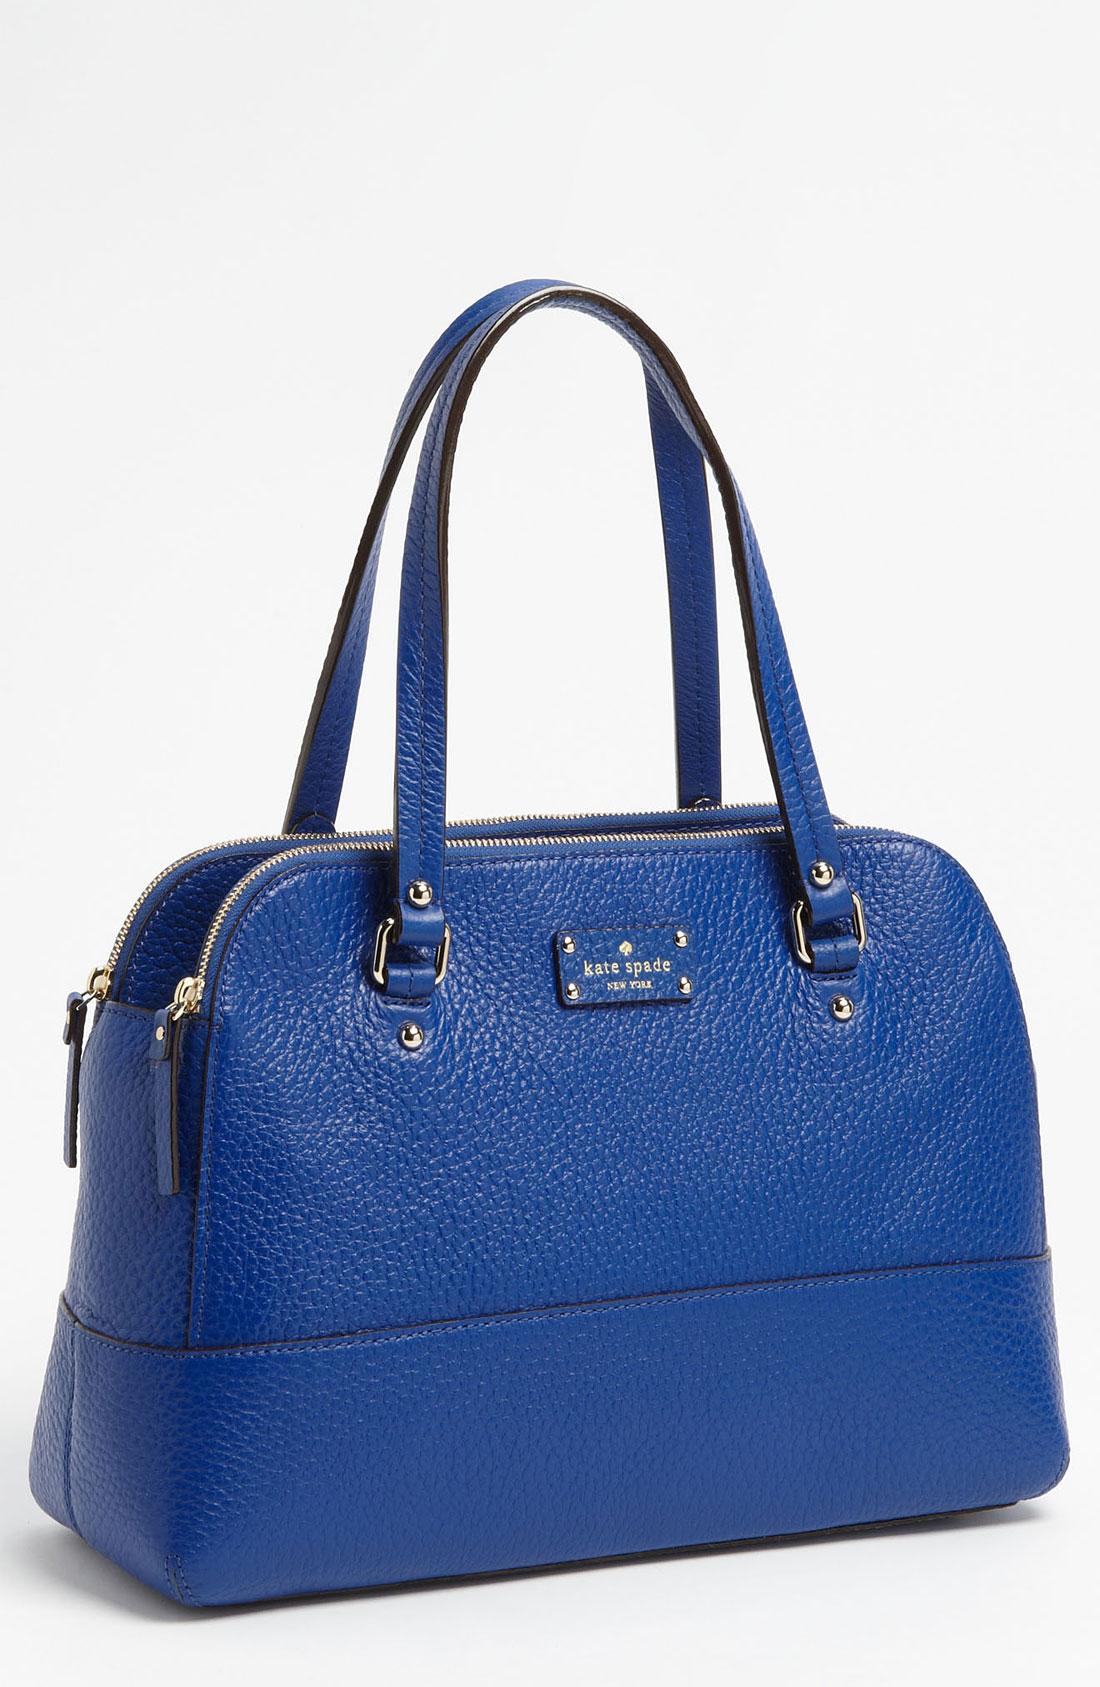 Kate Spade Blue Grove Court Lainey Shoulder Bag 118